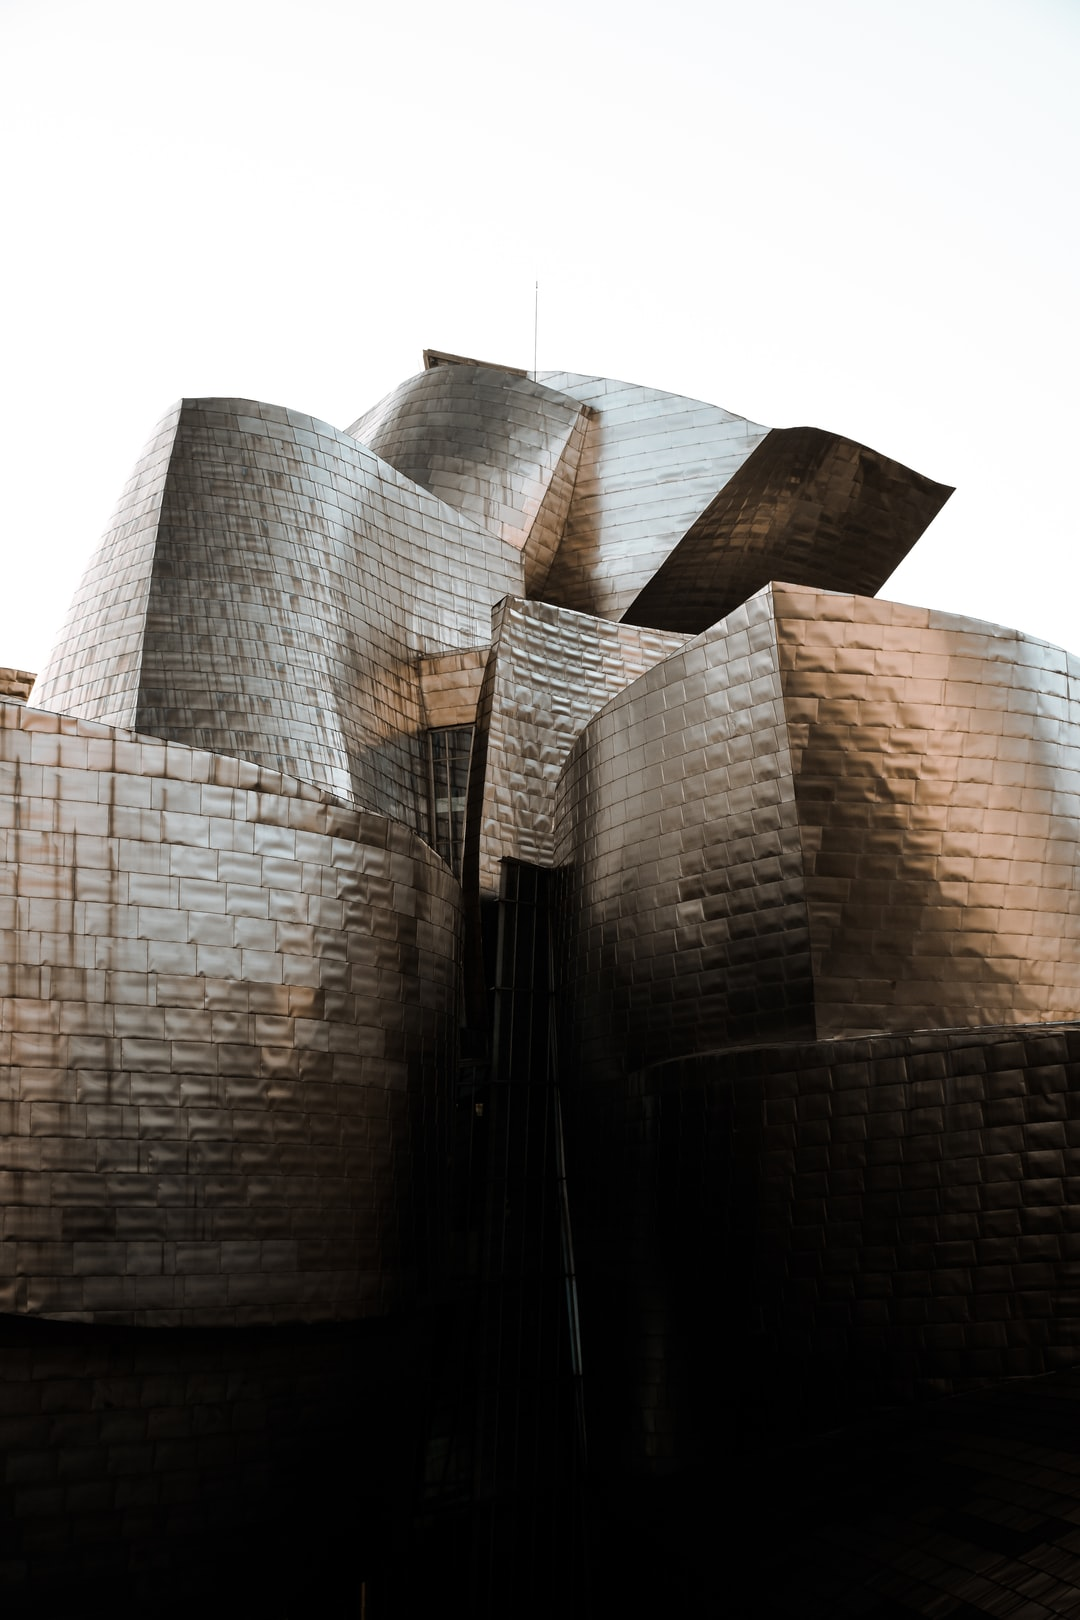 Architecture in Spain edoardo_ghost_cuoghi on instagram